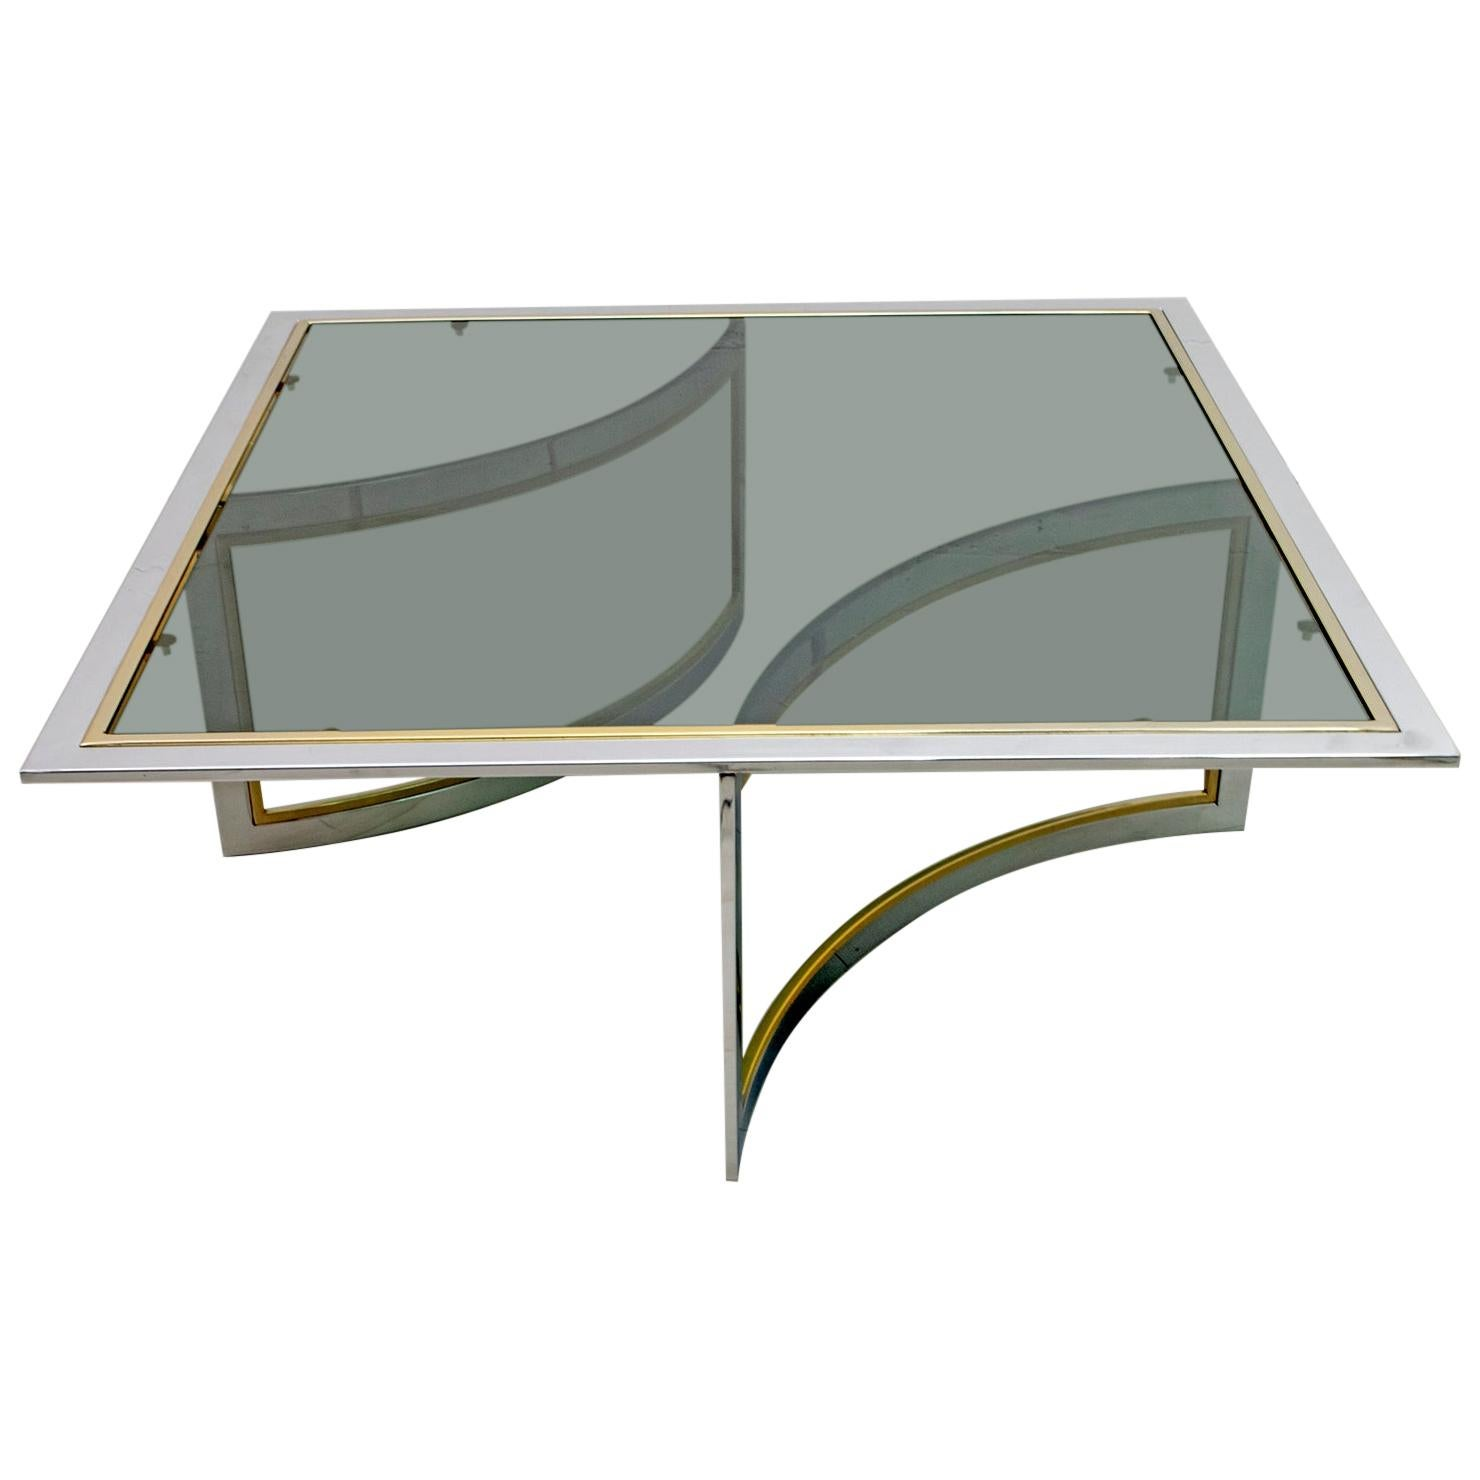 Romeo Rega Mid-Century Modern Italian Chrome and Brass Coffee Table, 1970s